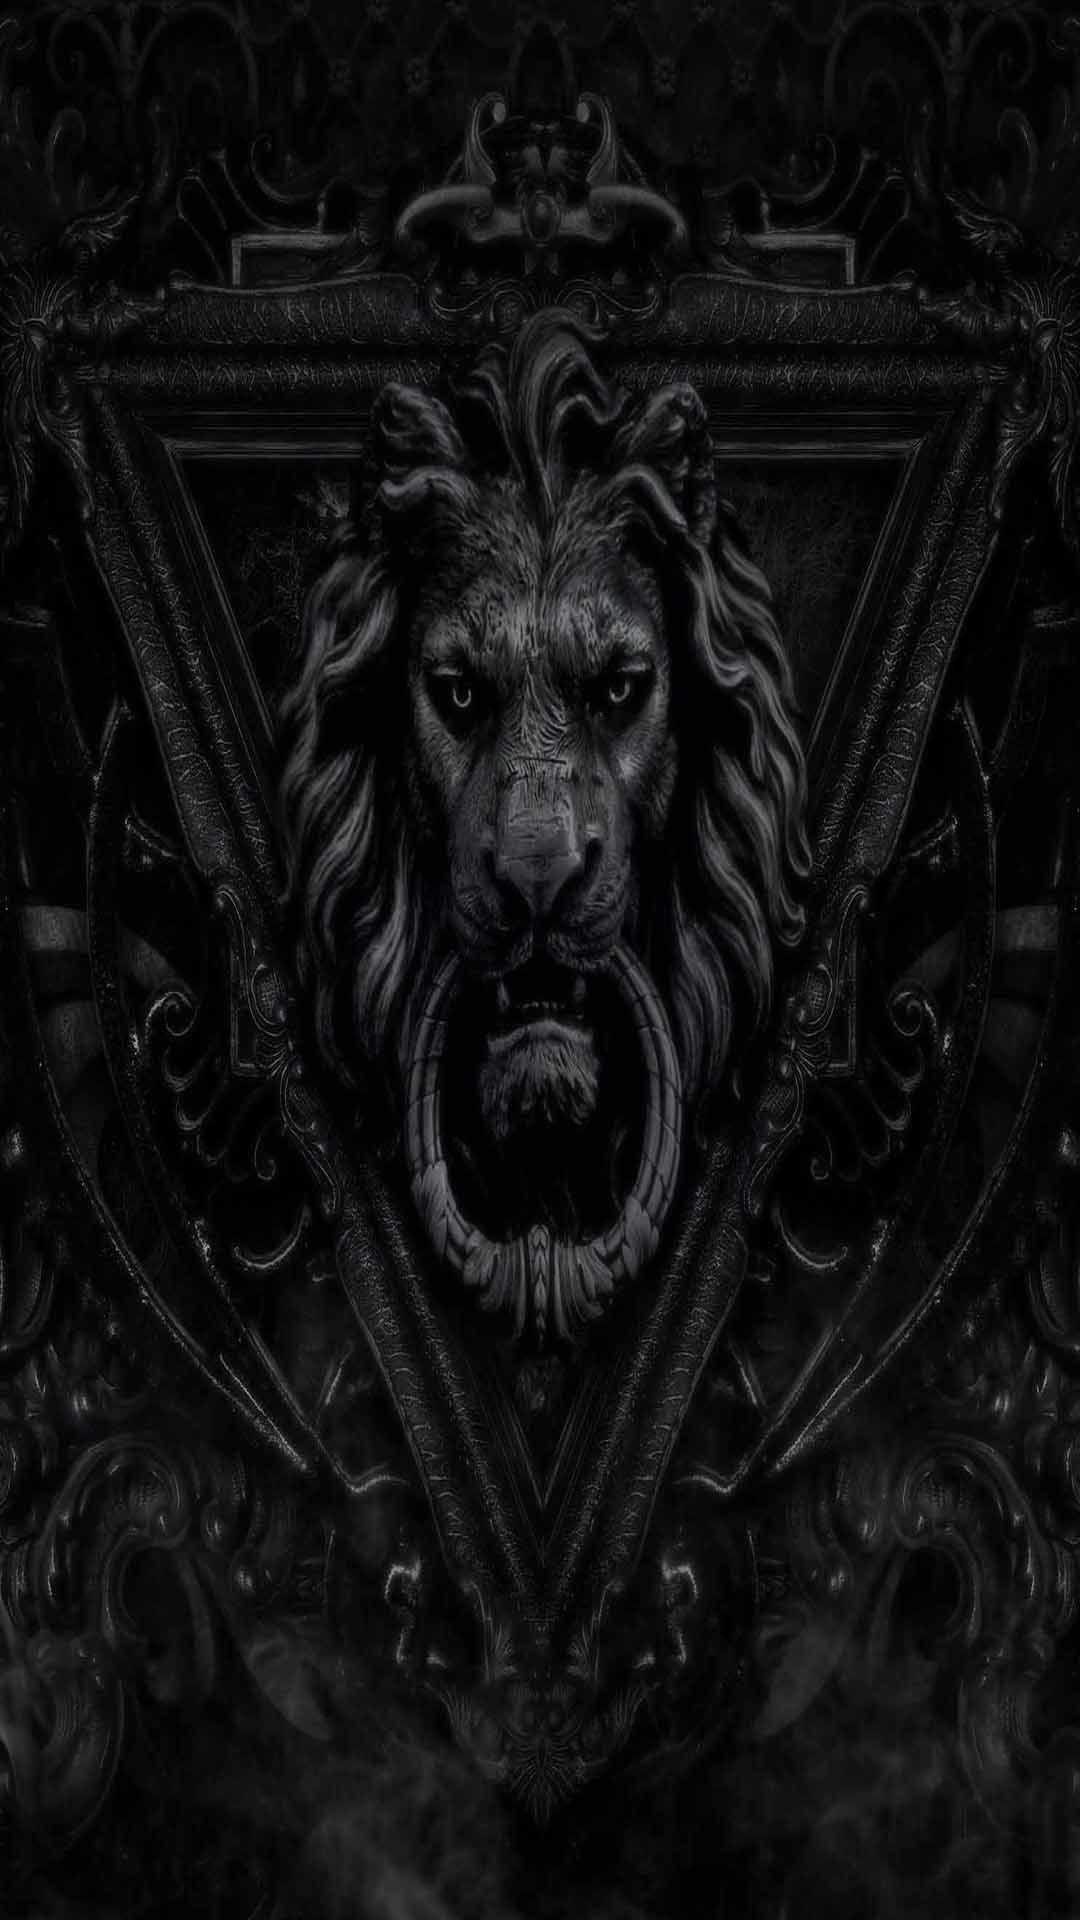 Black Lion Wallpaper Hd Hupages Download Iphone Wallpapers Lion Wallpaper Dark Wallpaper Black Lion